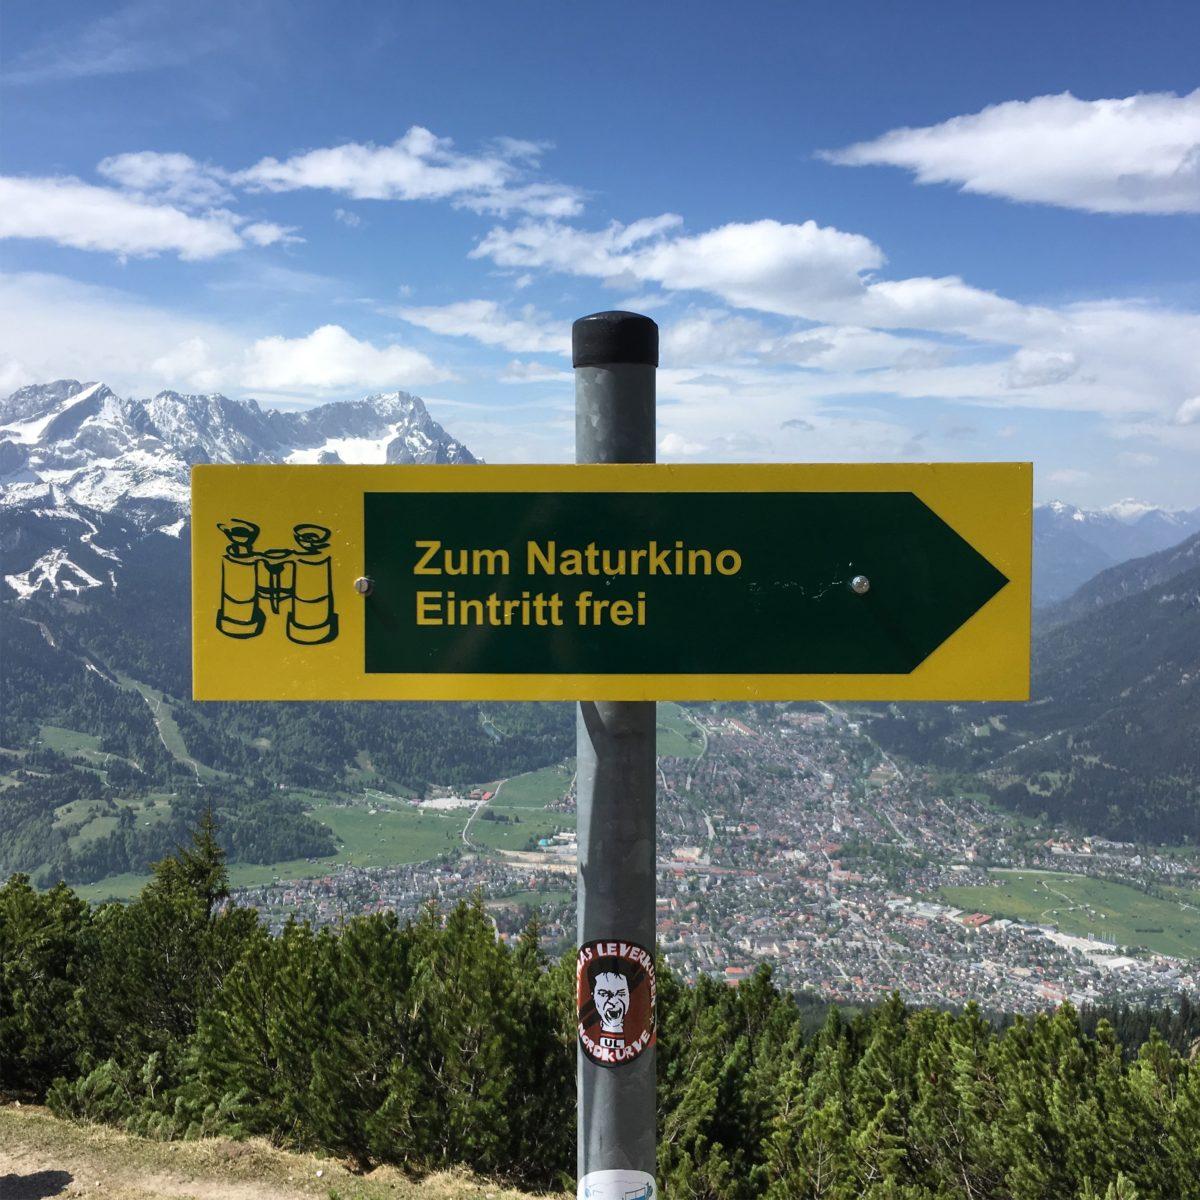 Naturkino am Wank - Eintritt frei!